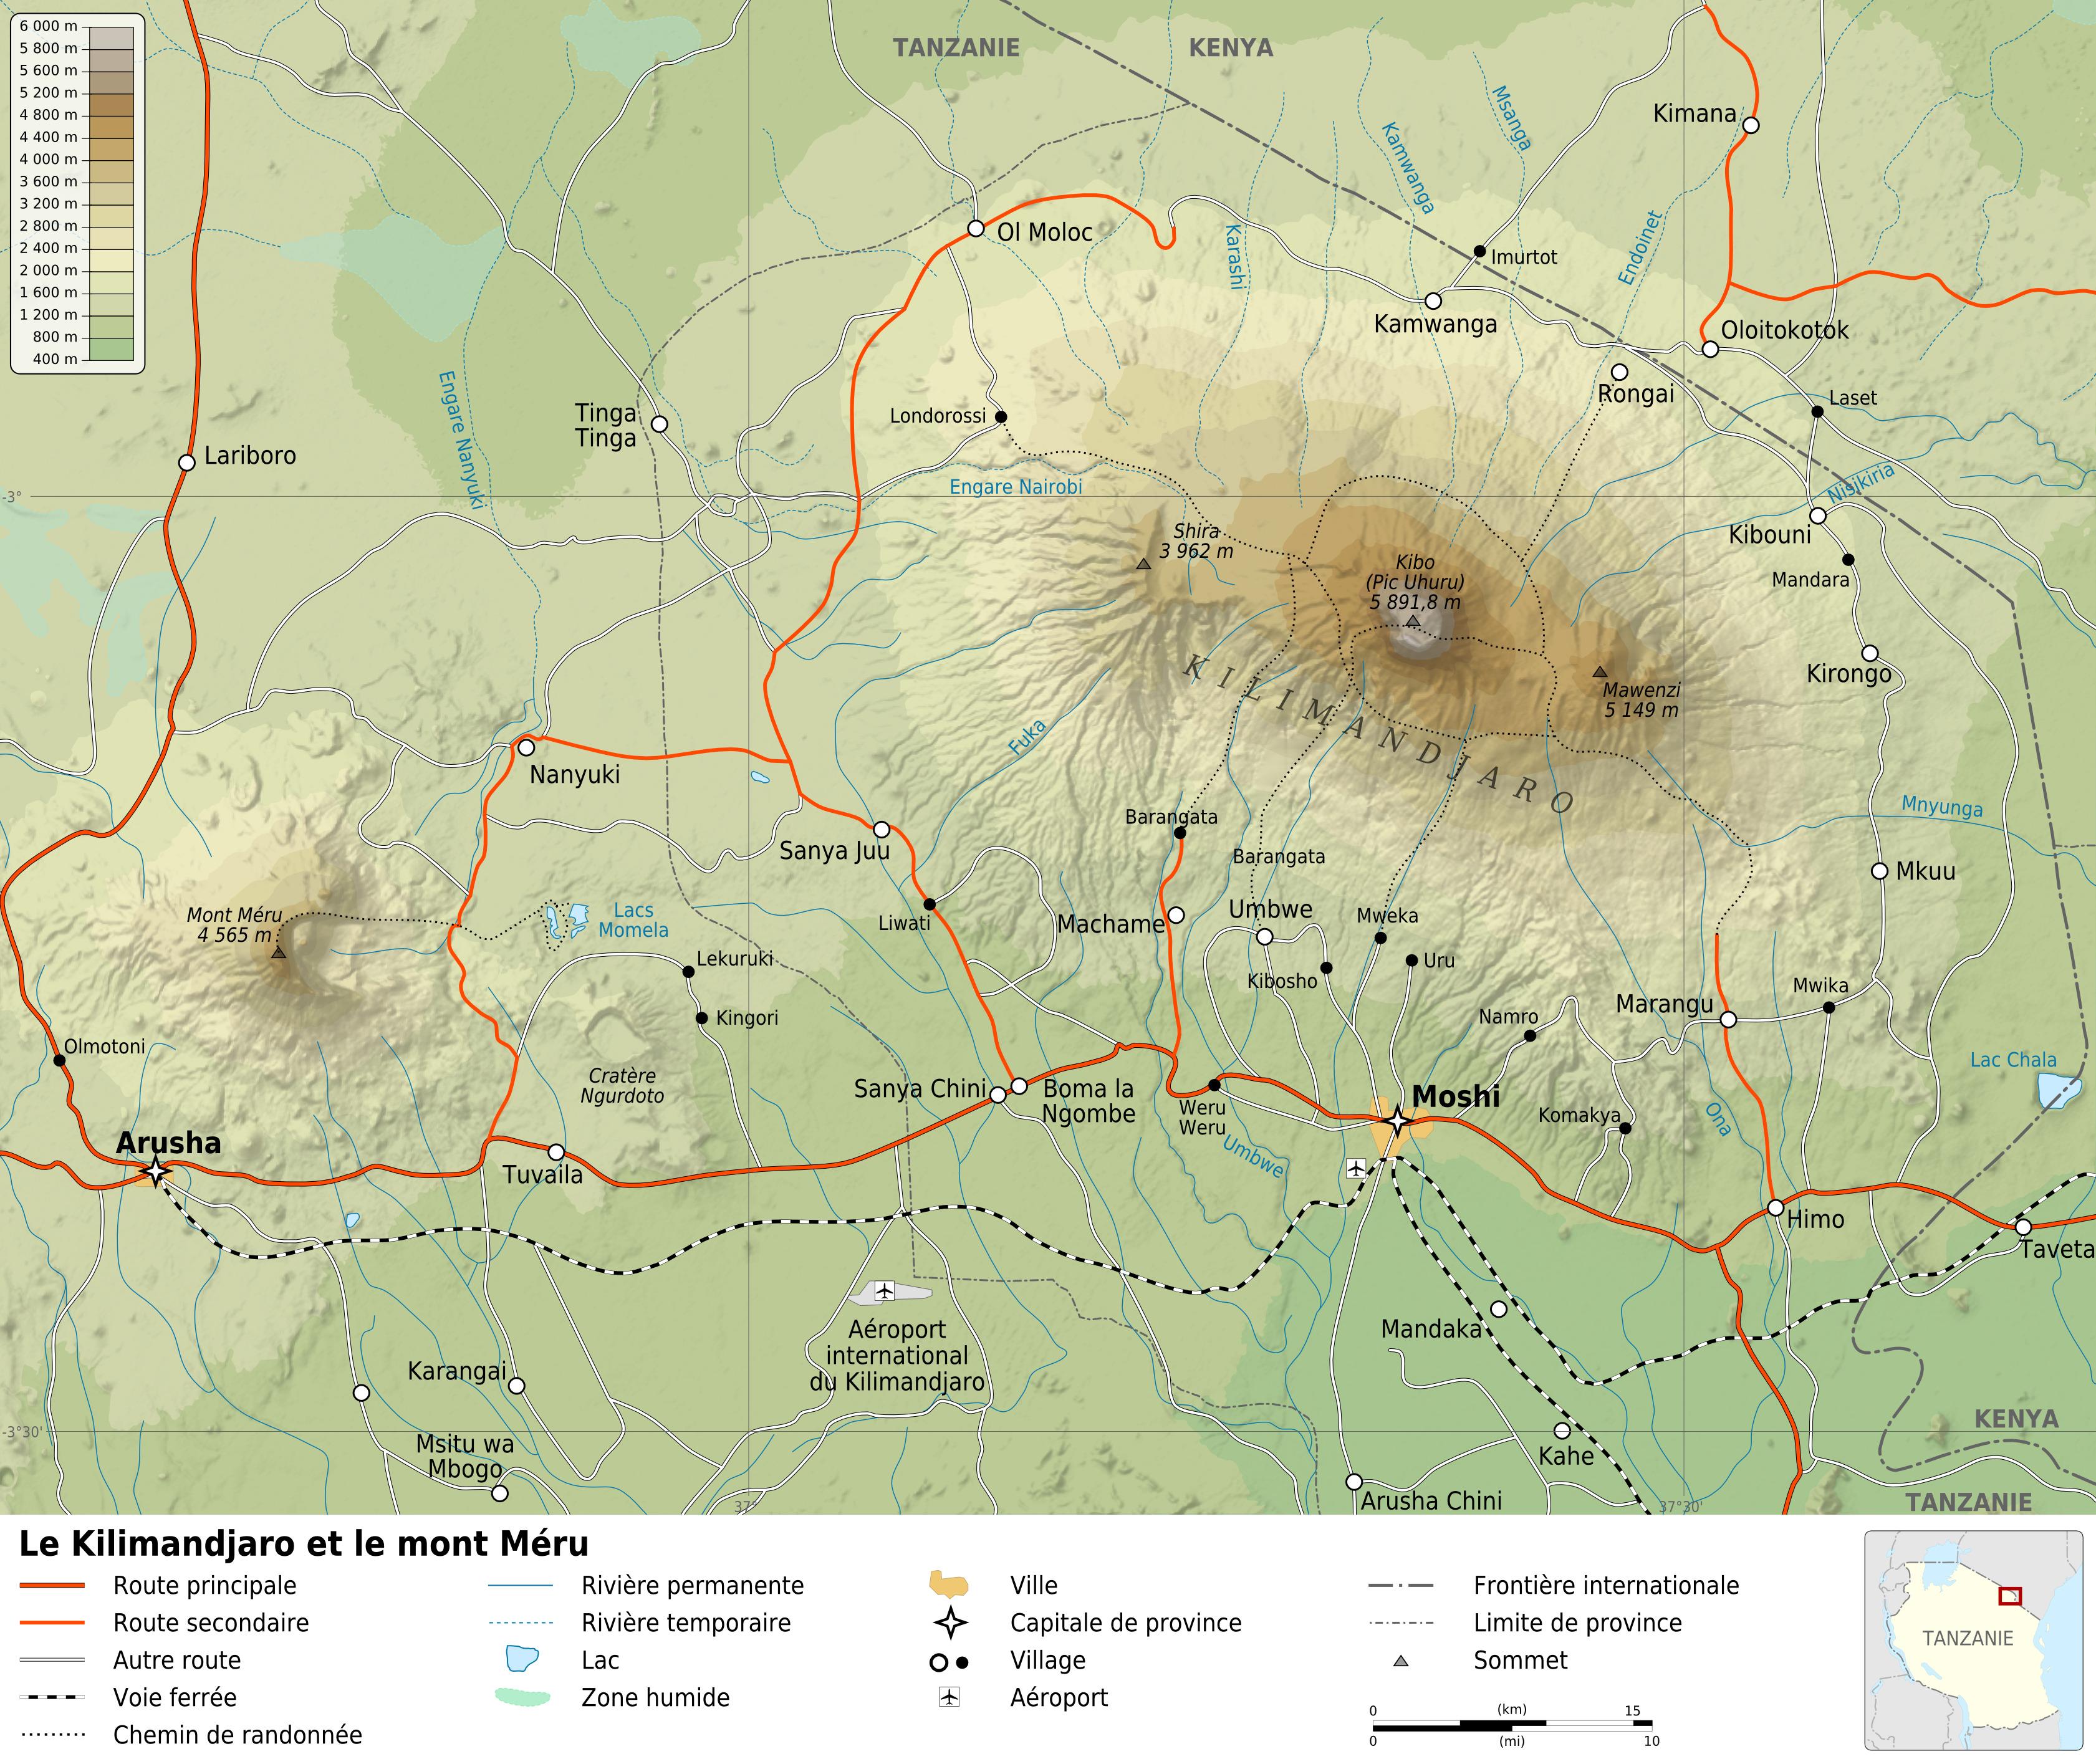 filemount kilimanjaro and mount meru mapfr. filemount kilimanjaro and mount meru mapfr  wikimedia commons